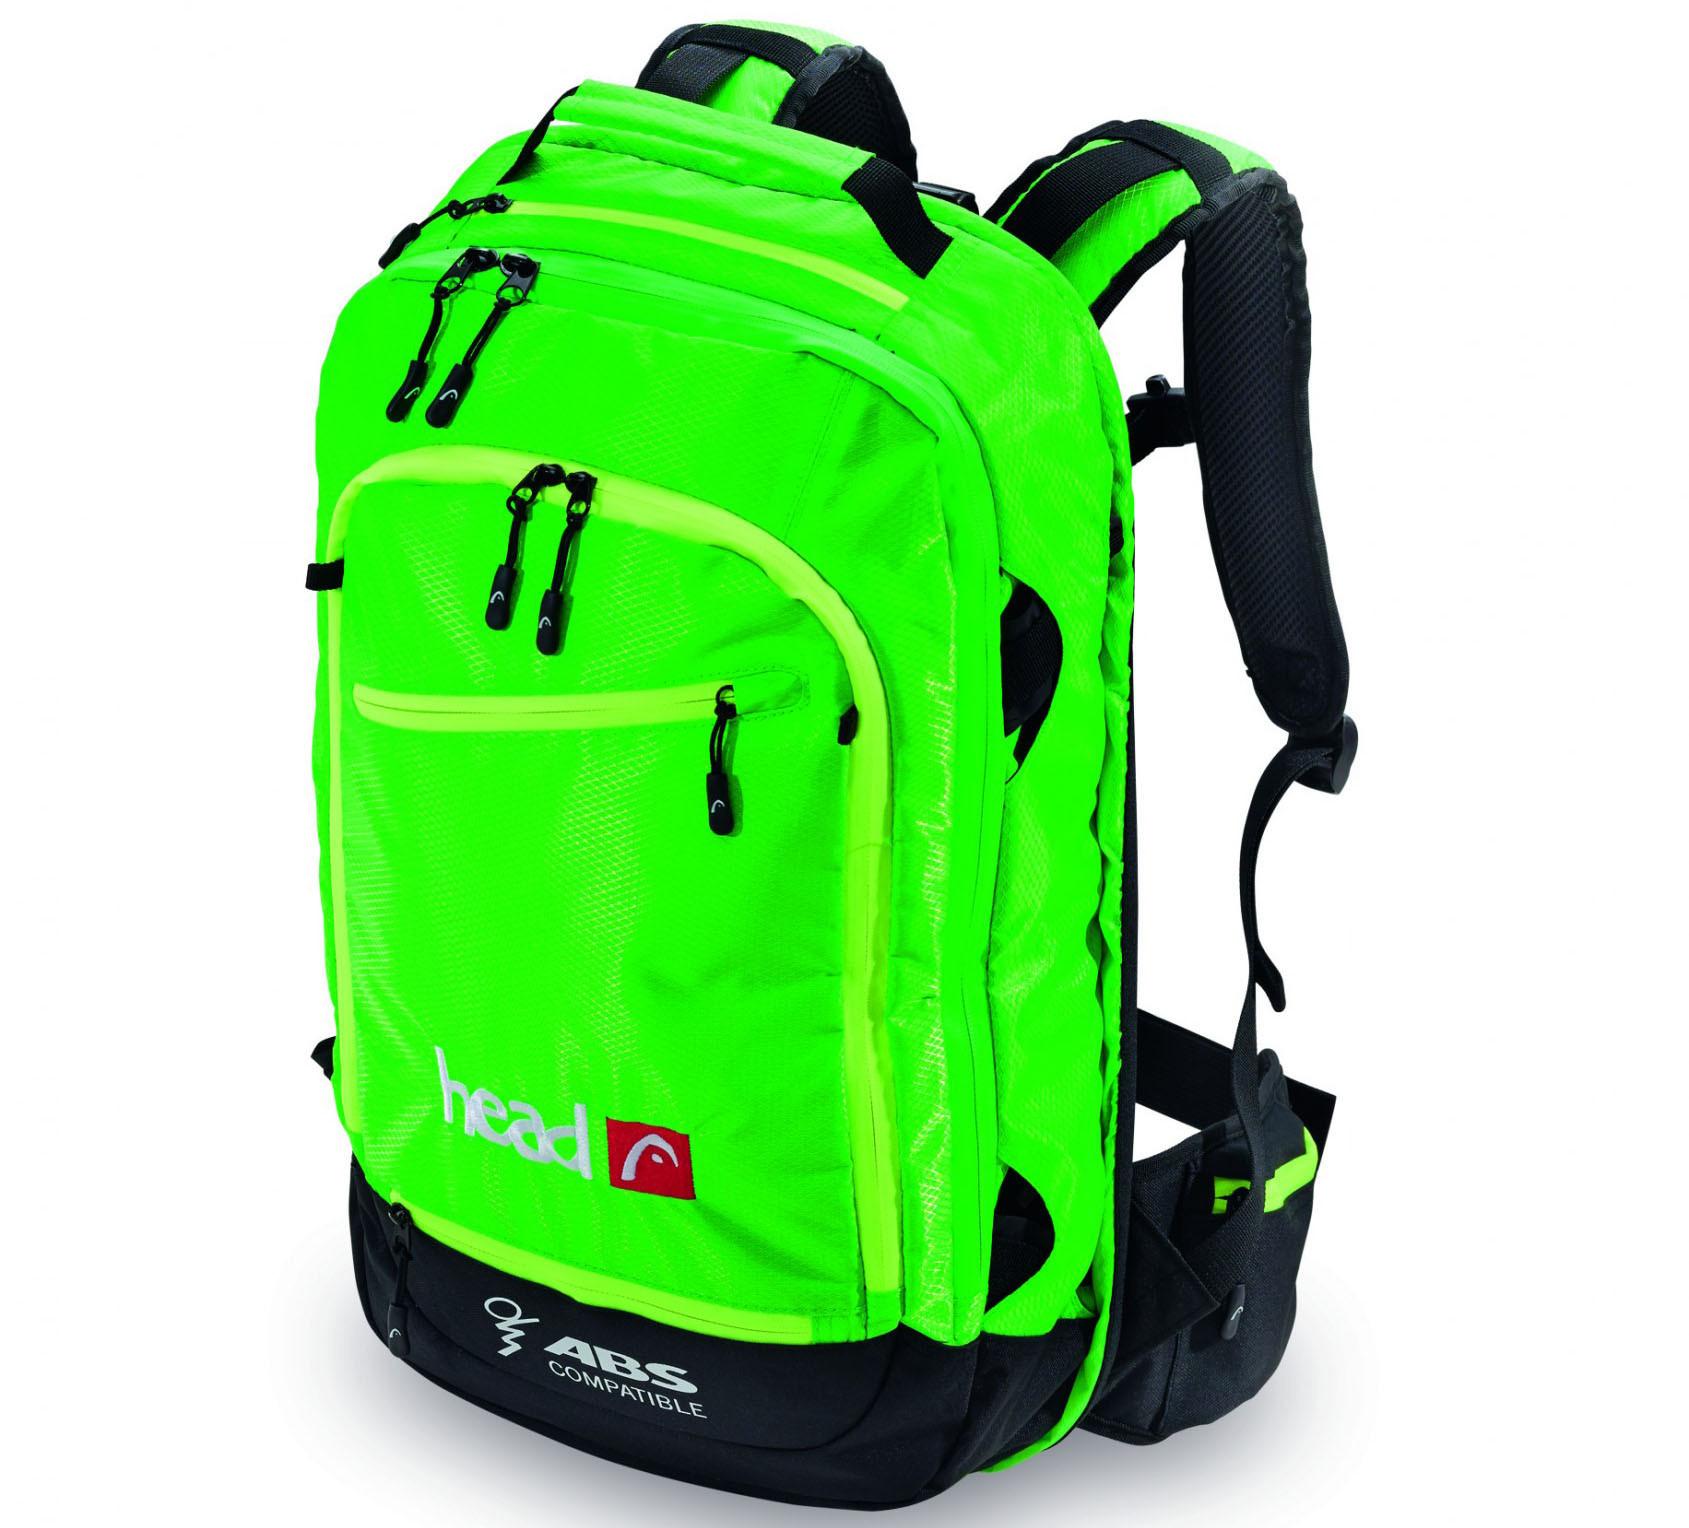 Рюкзак head горнолыжный курорт рюкзак deuter 2015 family schmusebar turquoise